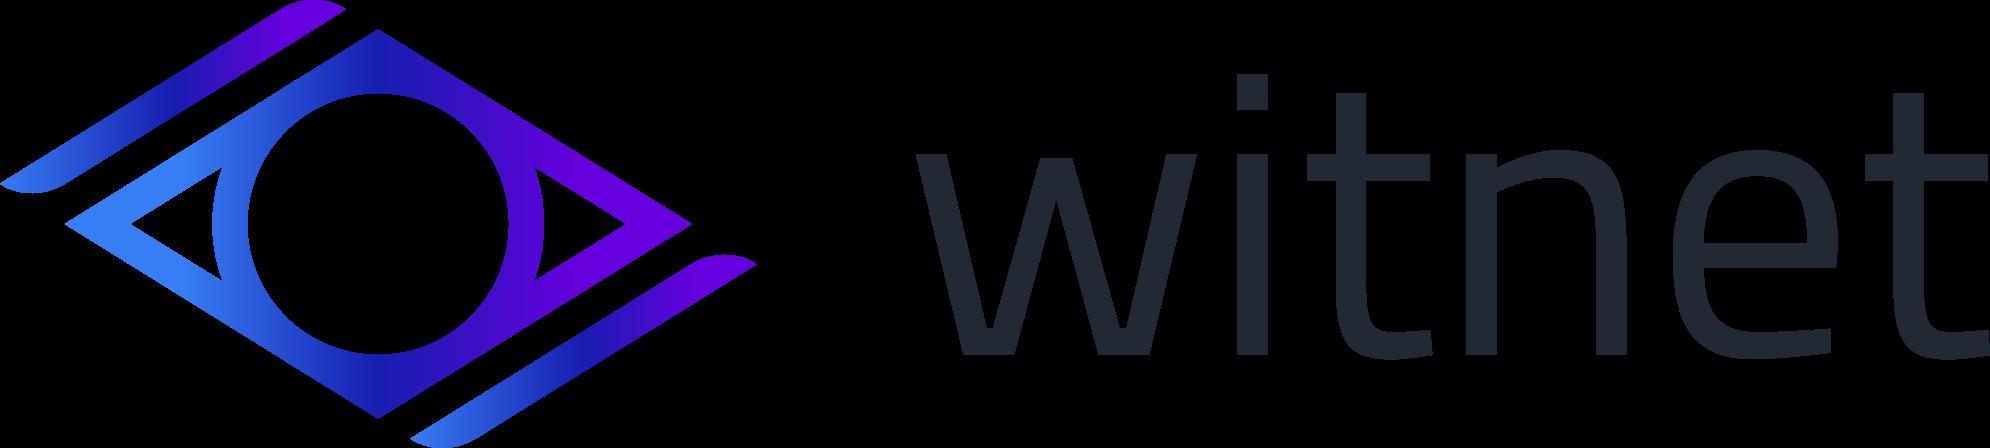 GitHub - elpheria/rpc-websockets: JSON-RPC 2 0 implementation over